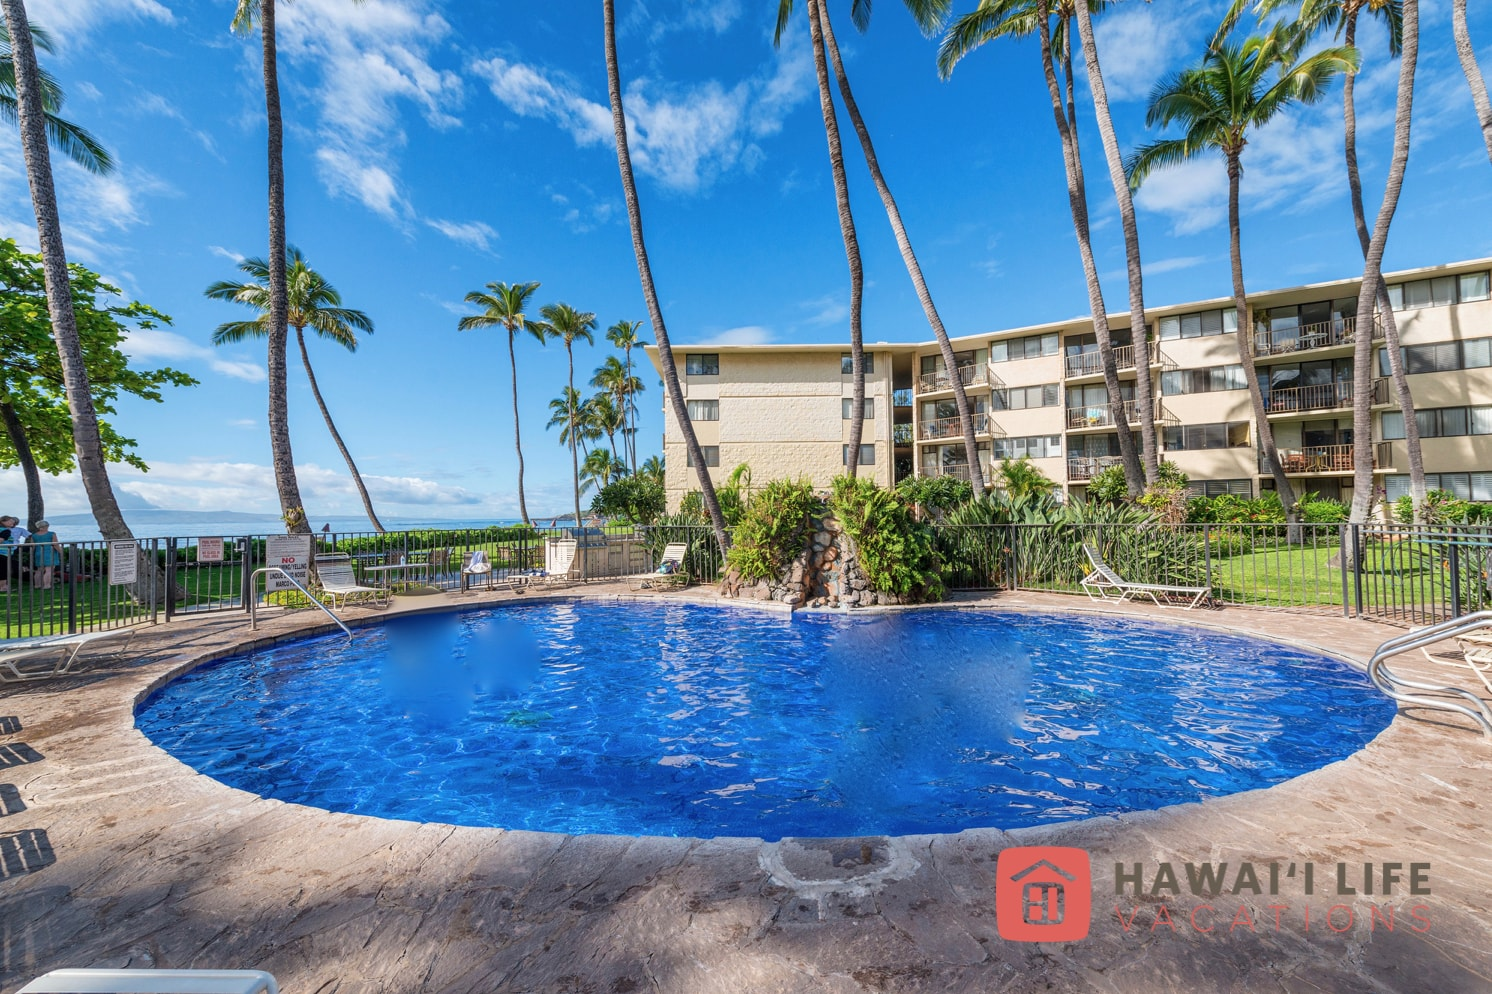 Kanai A Nalu Maui Vacation Rental - Pool